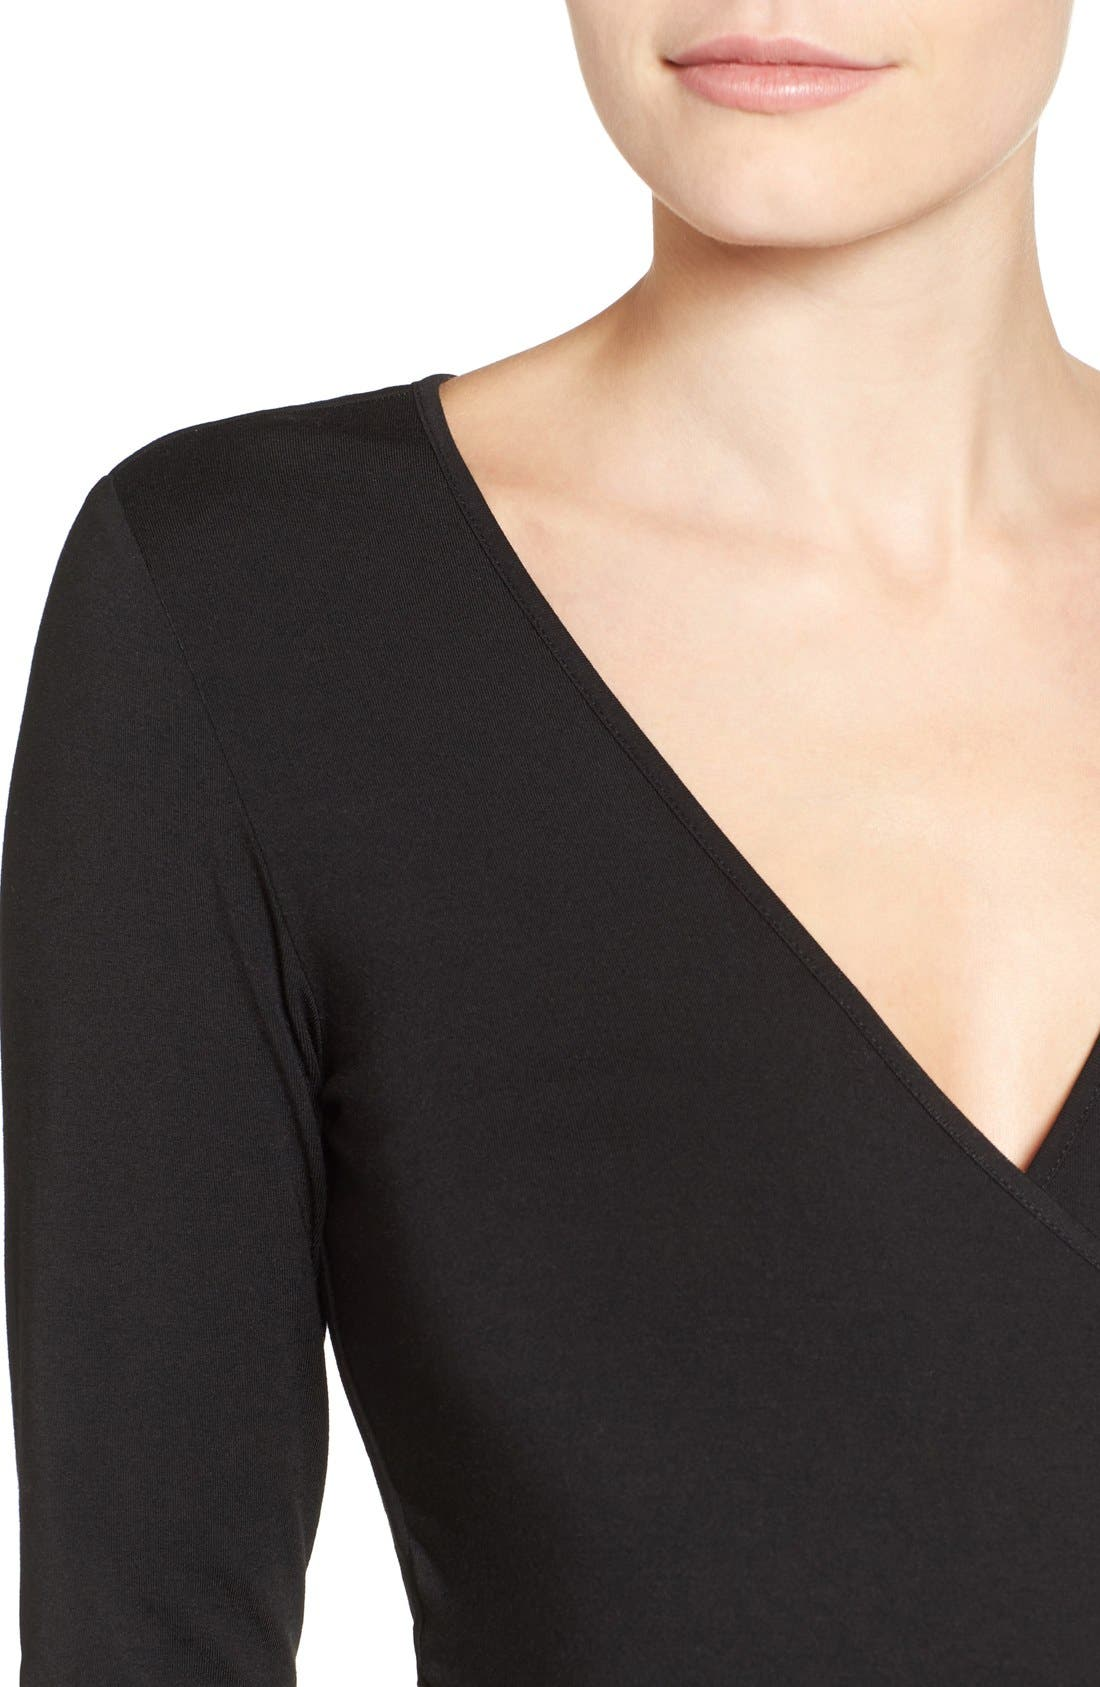 Tart 'Peaches' Maternity Body-Con Dress,                             Alternate thumbnail 4, color,                             BLACK